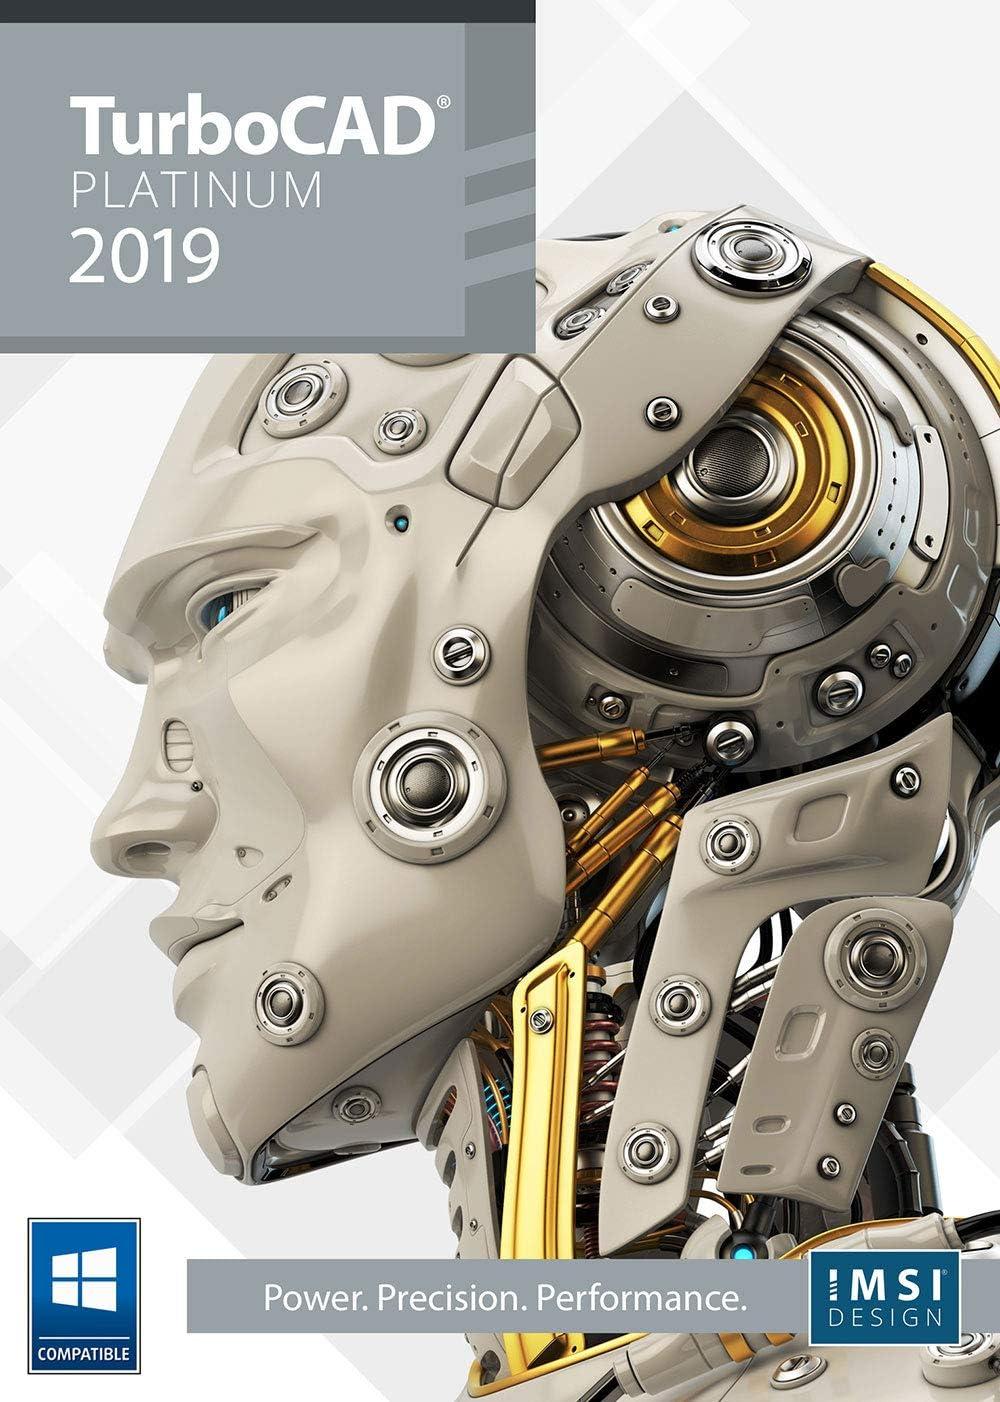 TurboCAD 2019 Platinum Download PC Free Max 63% OFF shipping New